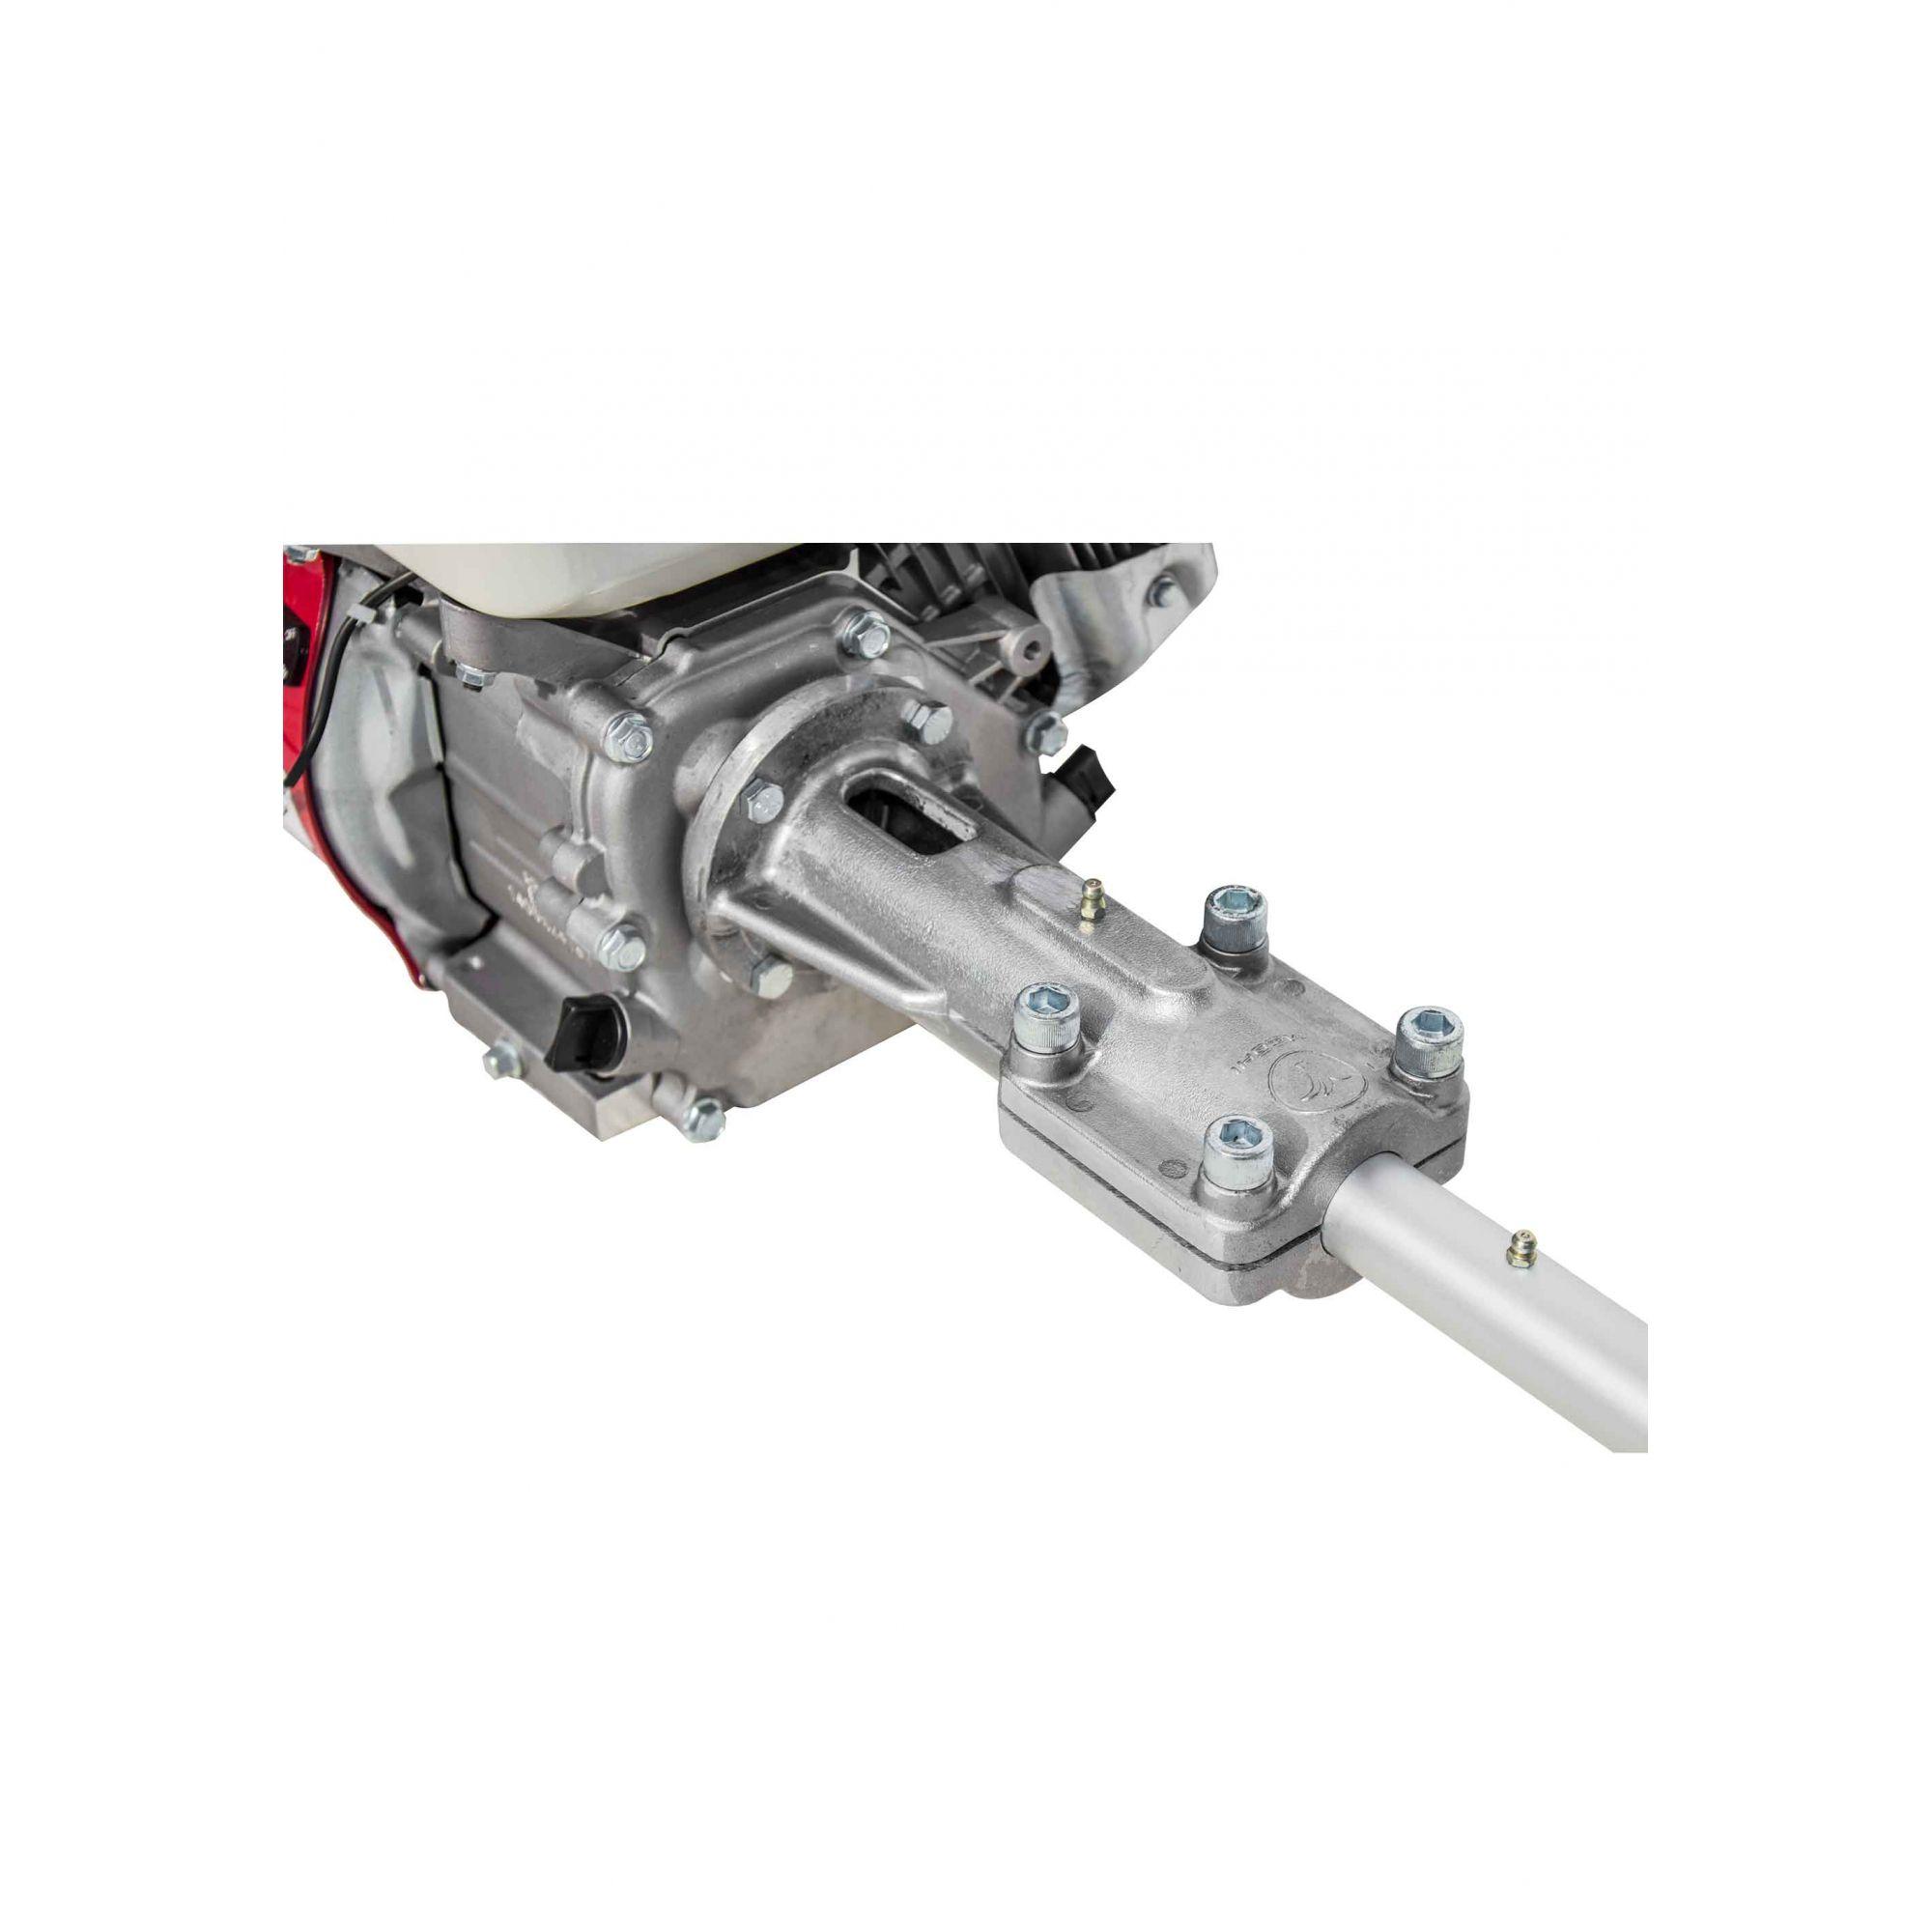 Kit Motor De Centro Barco Bote 1,20mt Motor 7 Die 08/09 Gaso